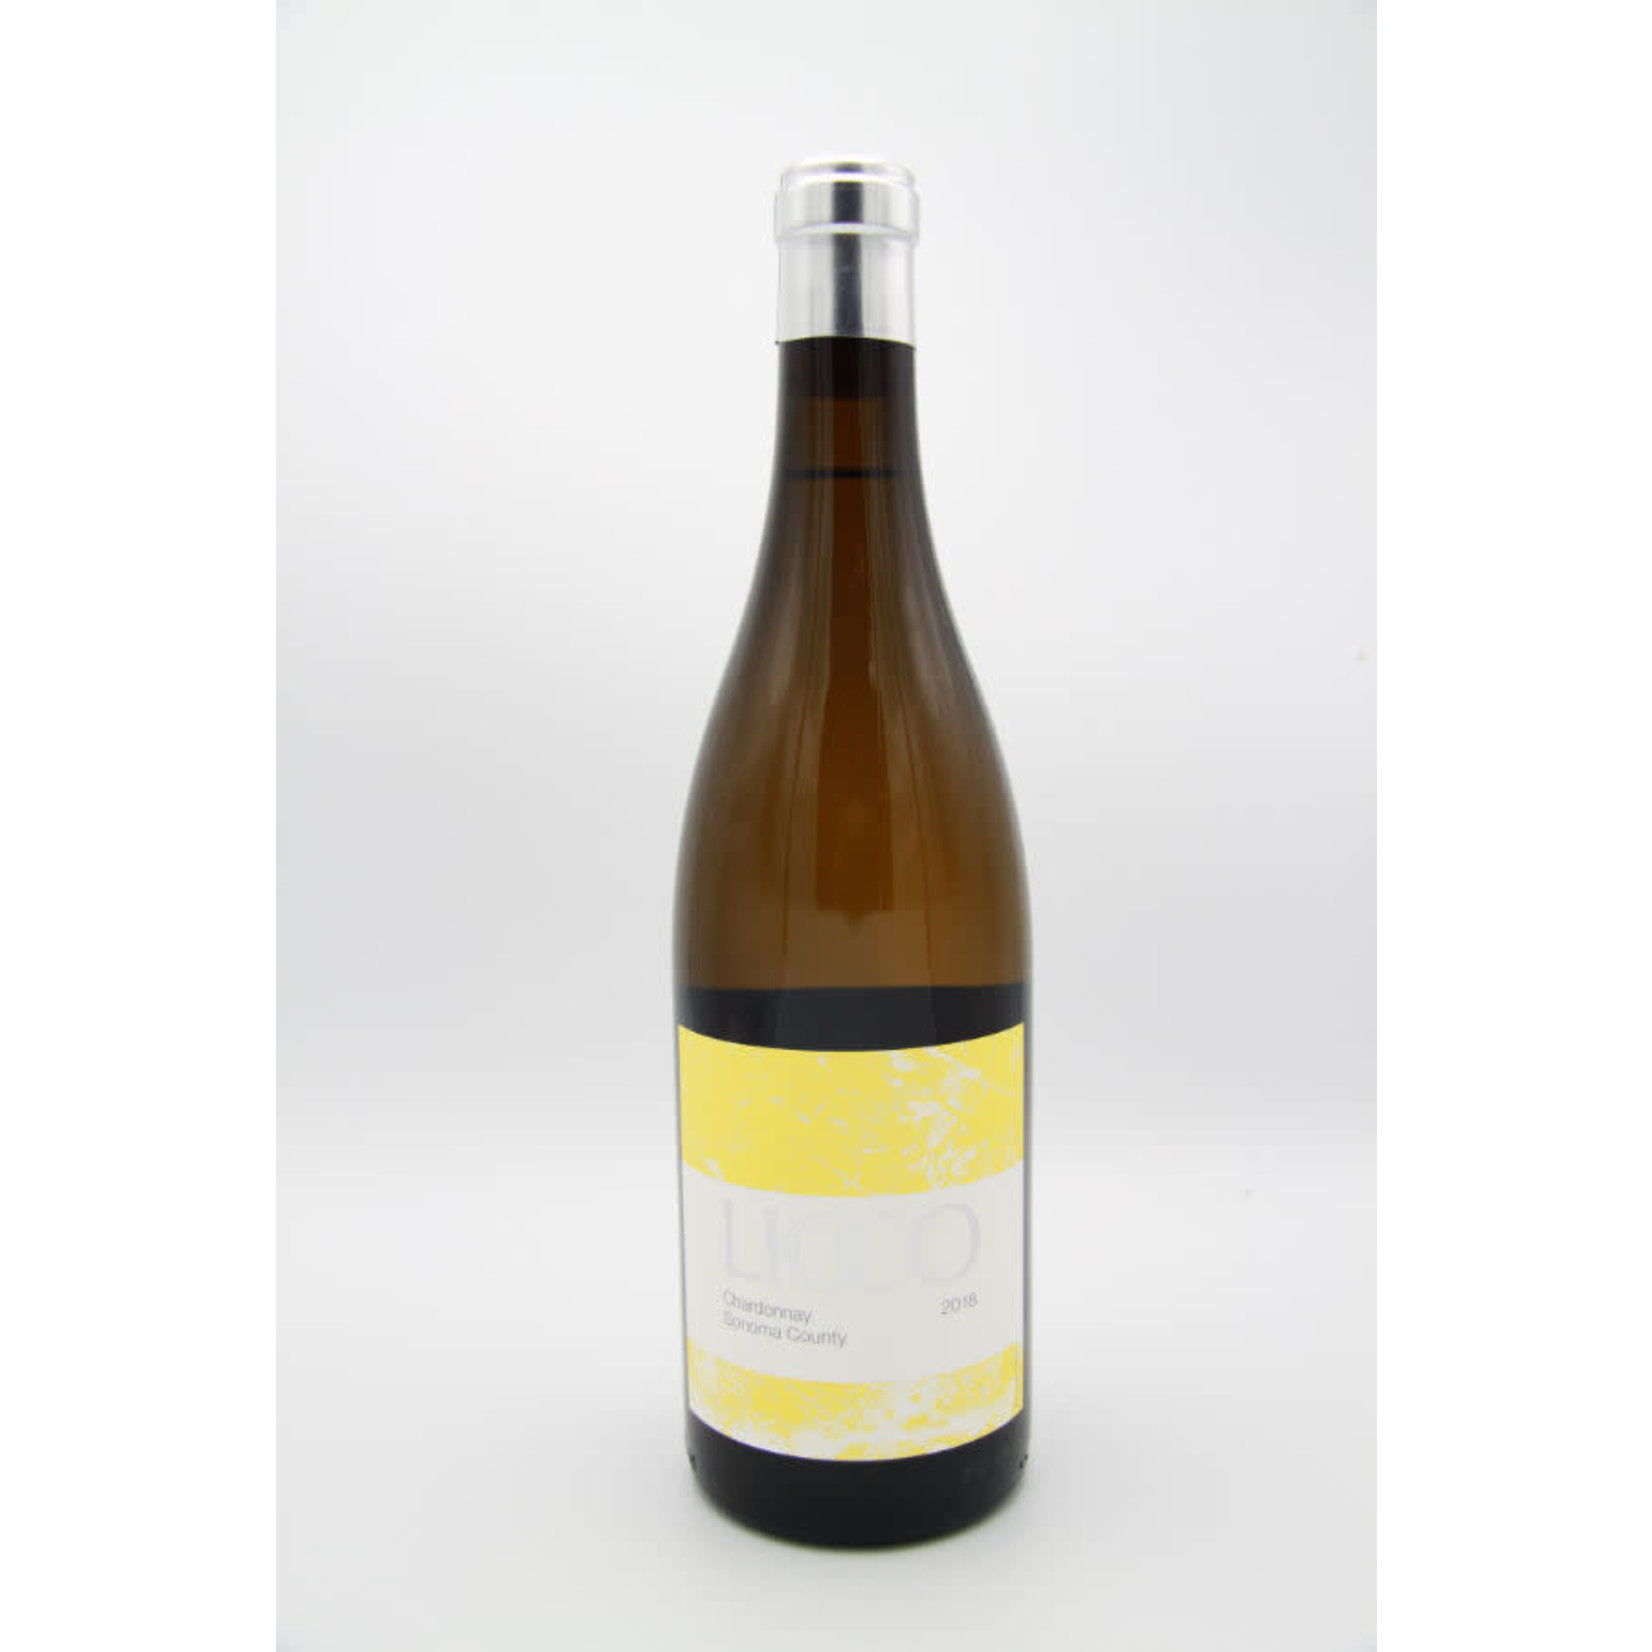 2018 LIOCO Chardonnay